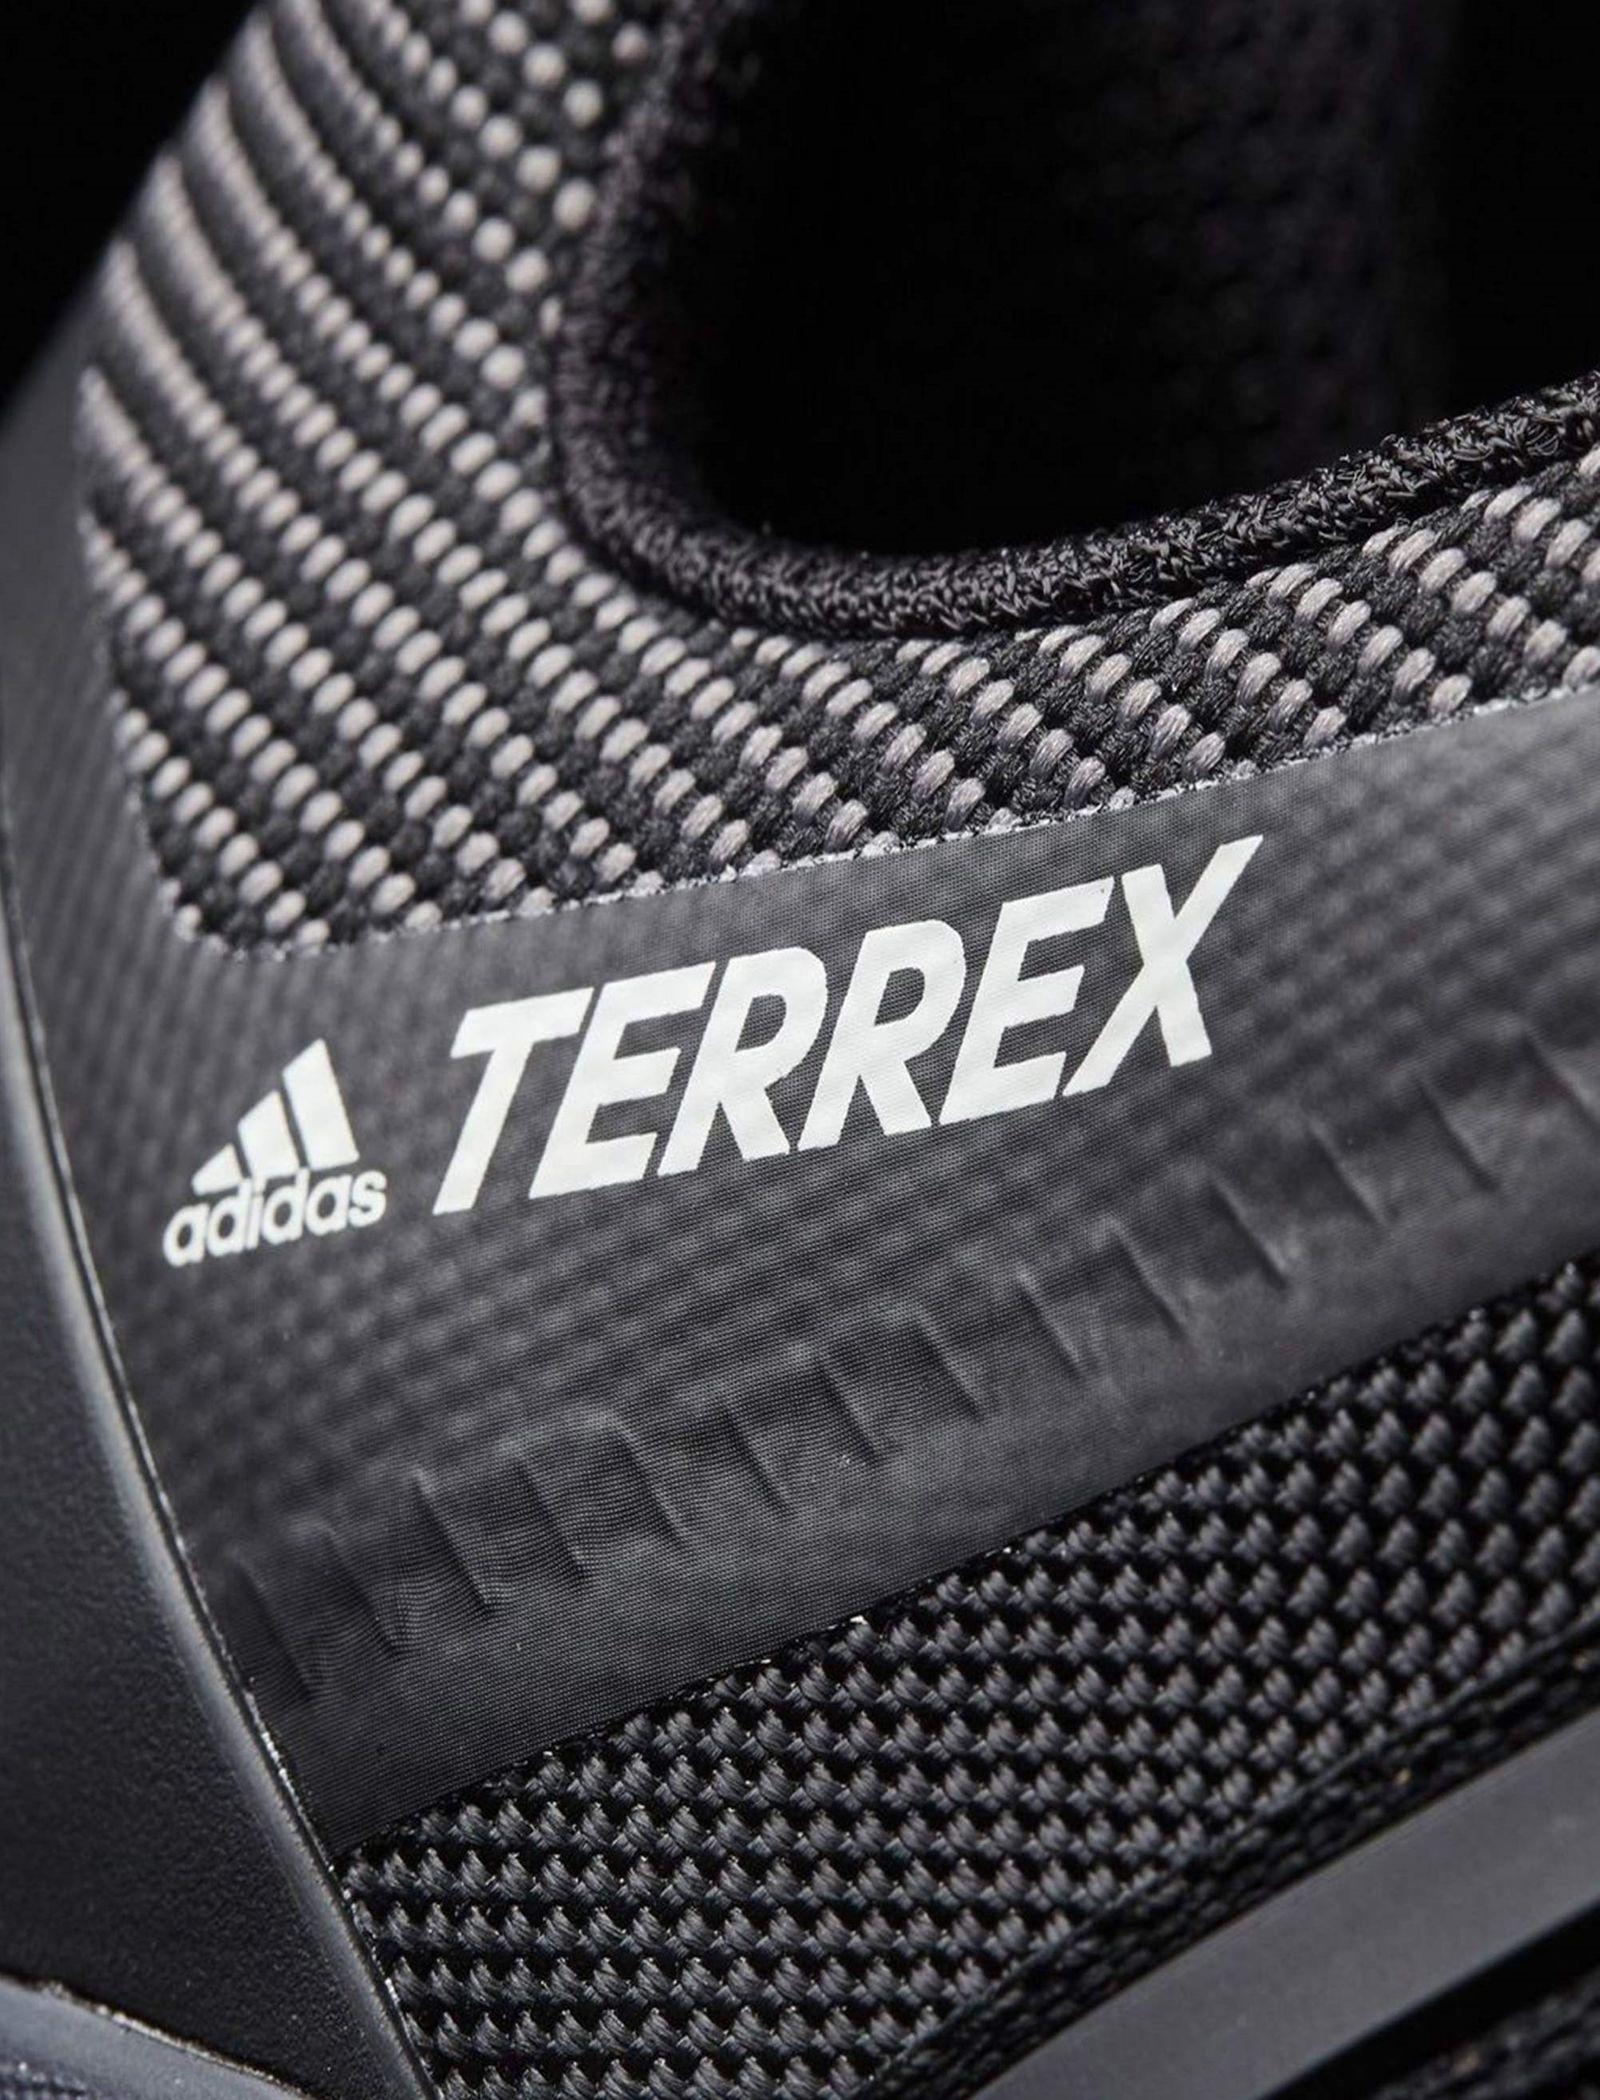 کفش طبیعت گردی بندی مردانه Terrex Trail Cross SL - آدیداس - مشکي - 8